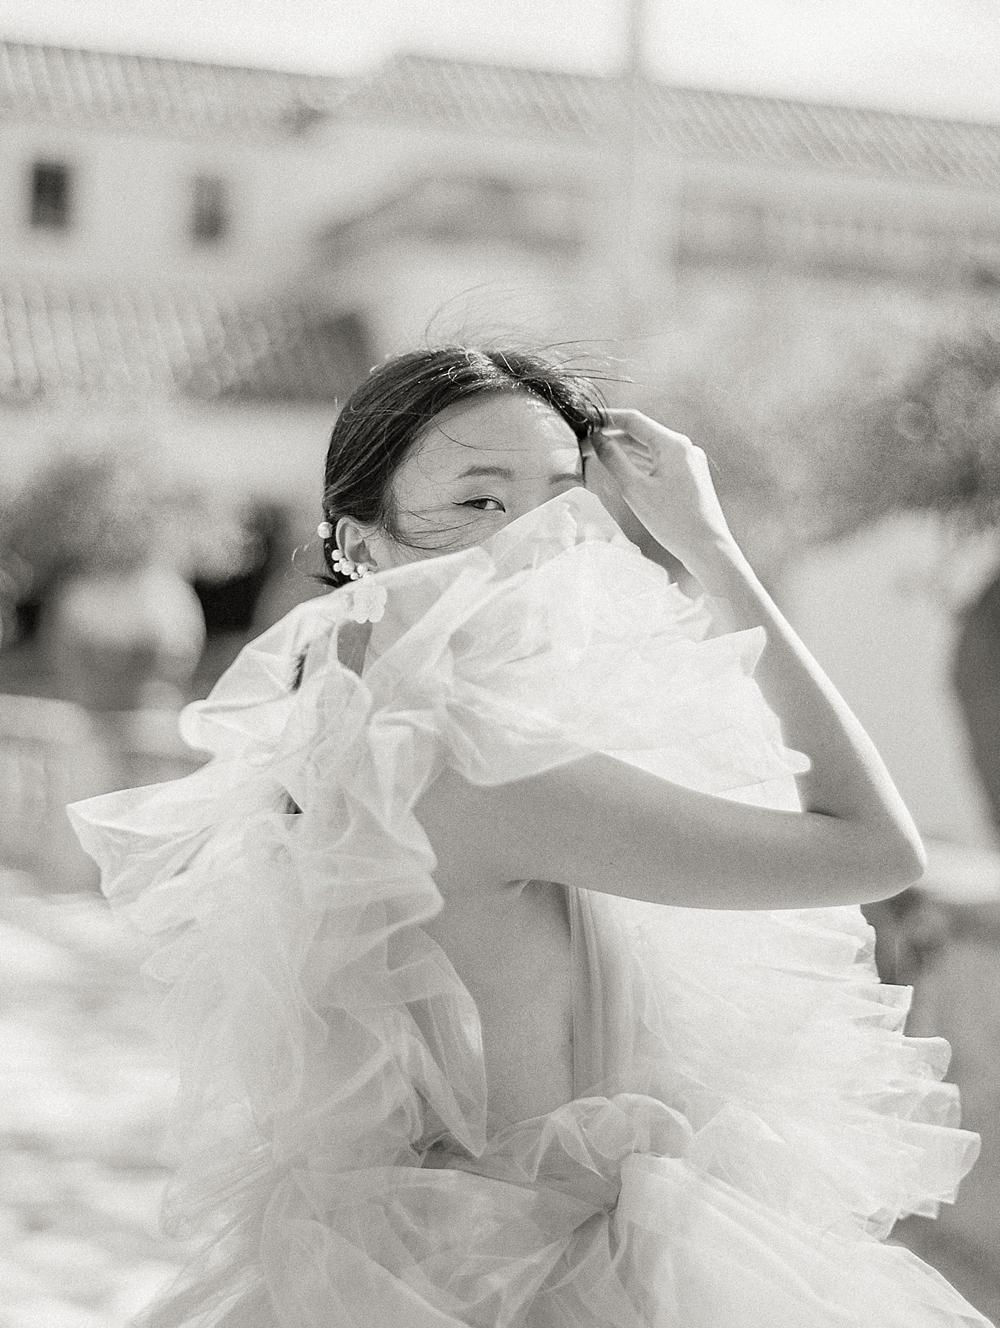 Kristin-La-Voie-Photography-Ringling-Sarasota-142